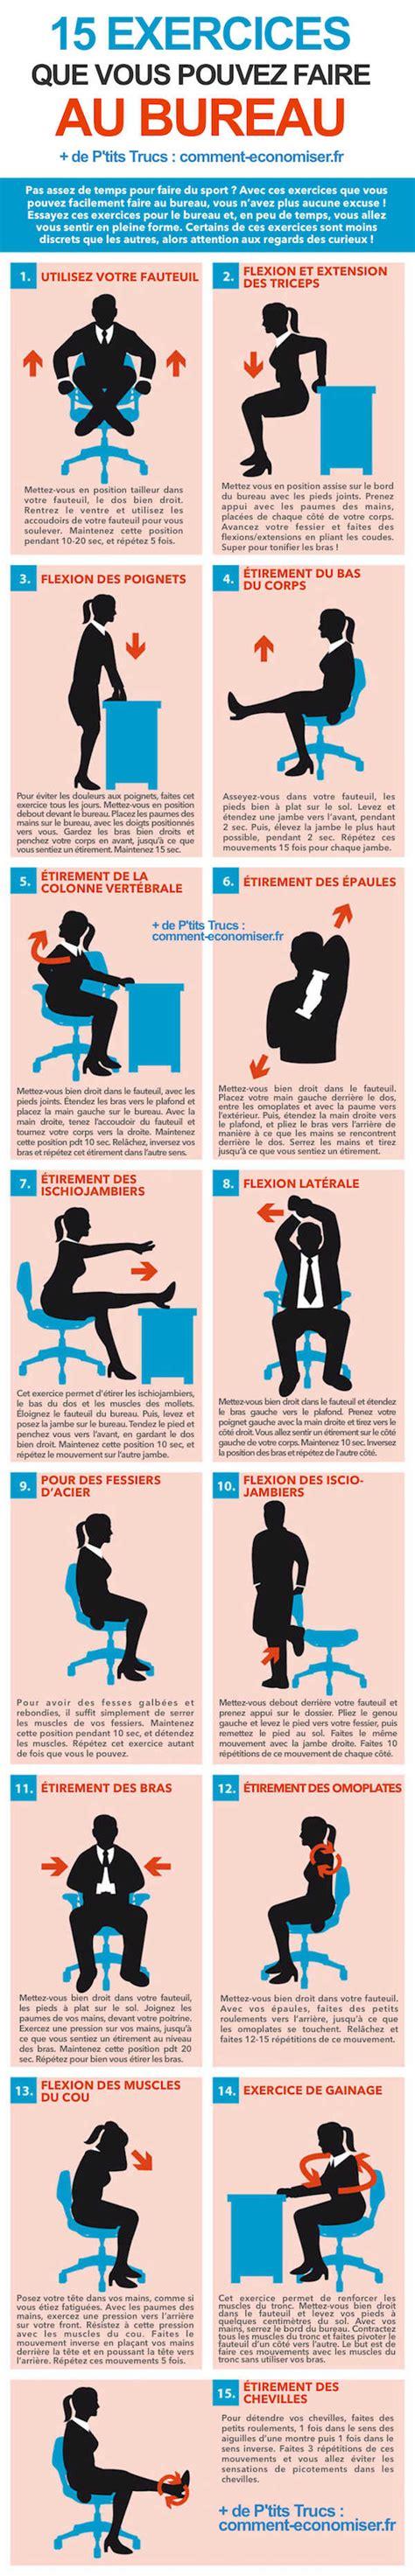 exercice au bureau 15 exercices faciles 224 faire au bureau ni vu ni connu